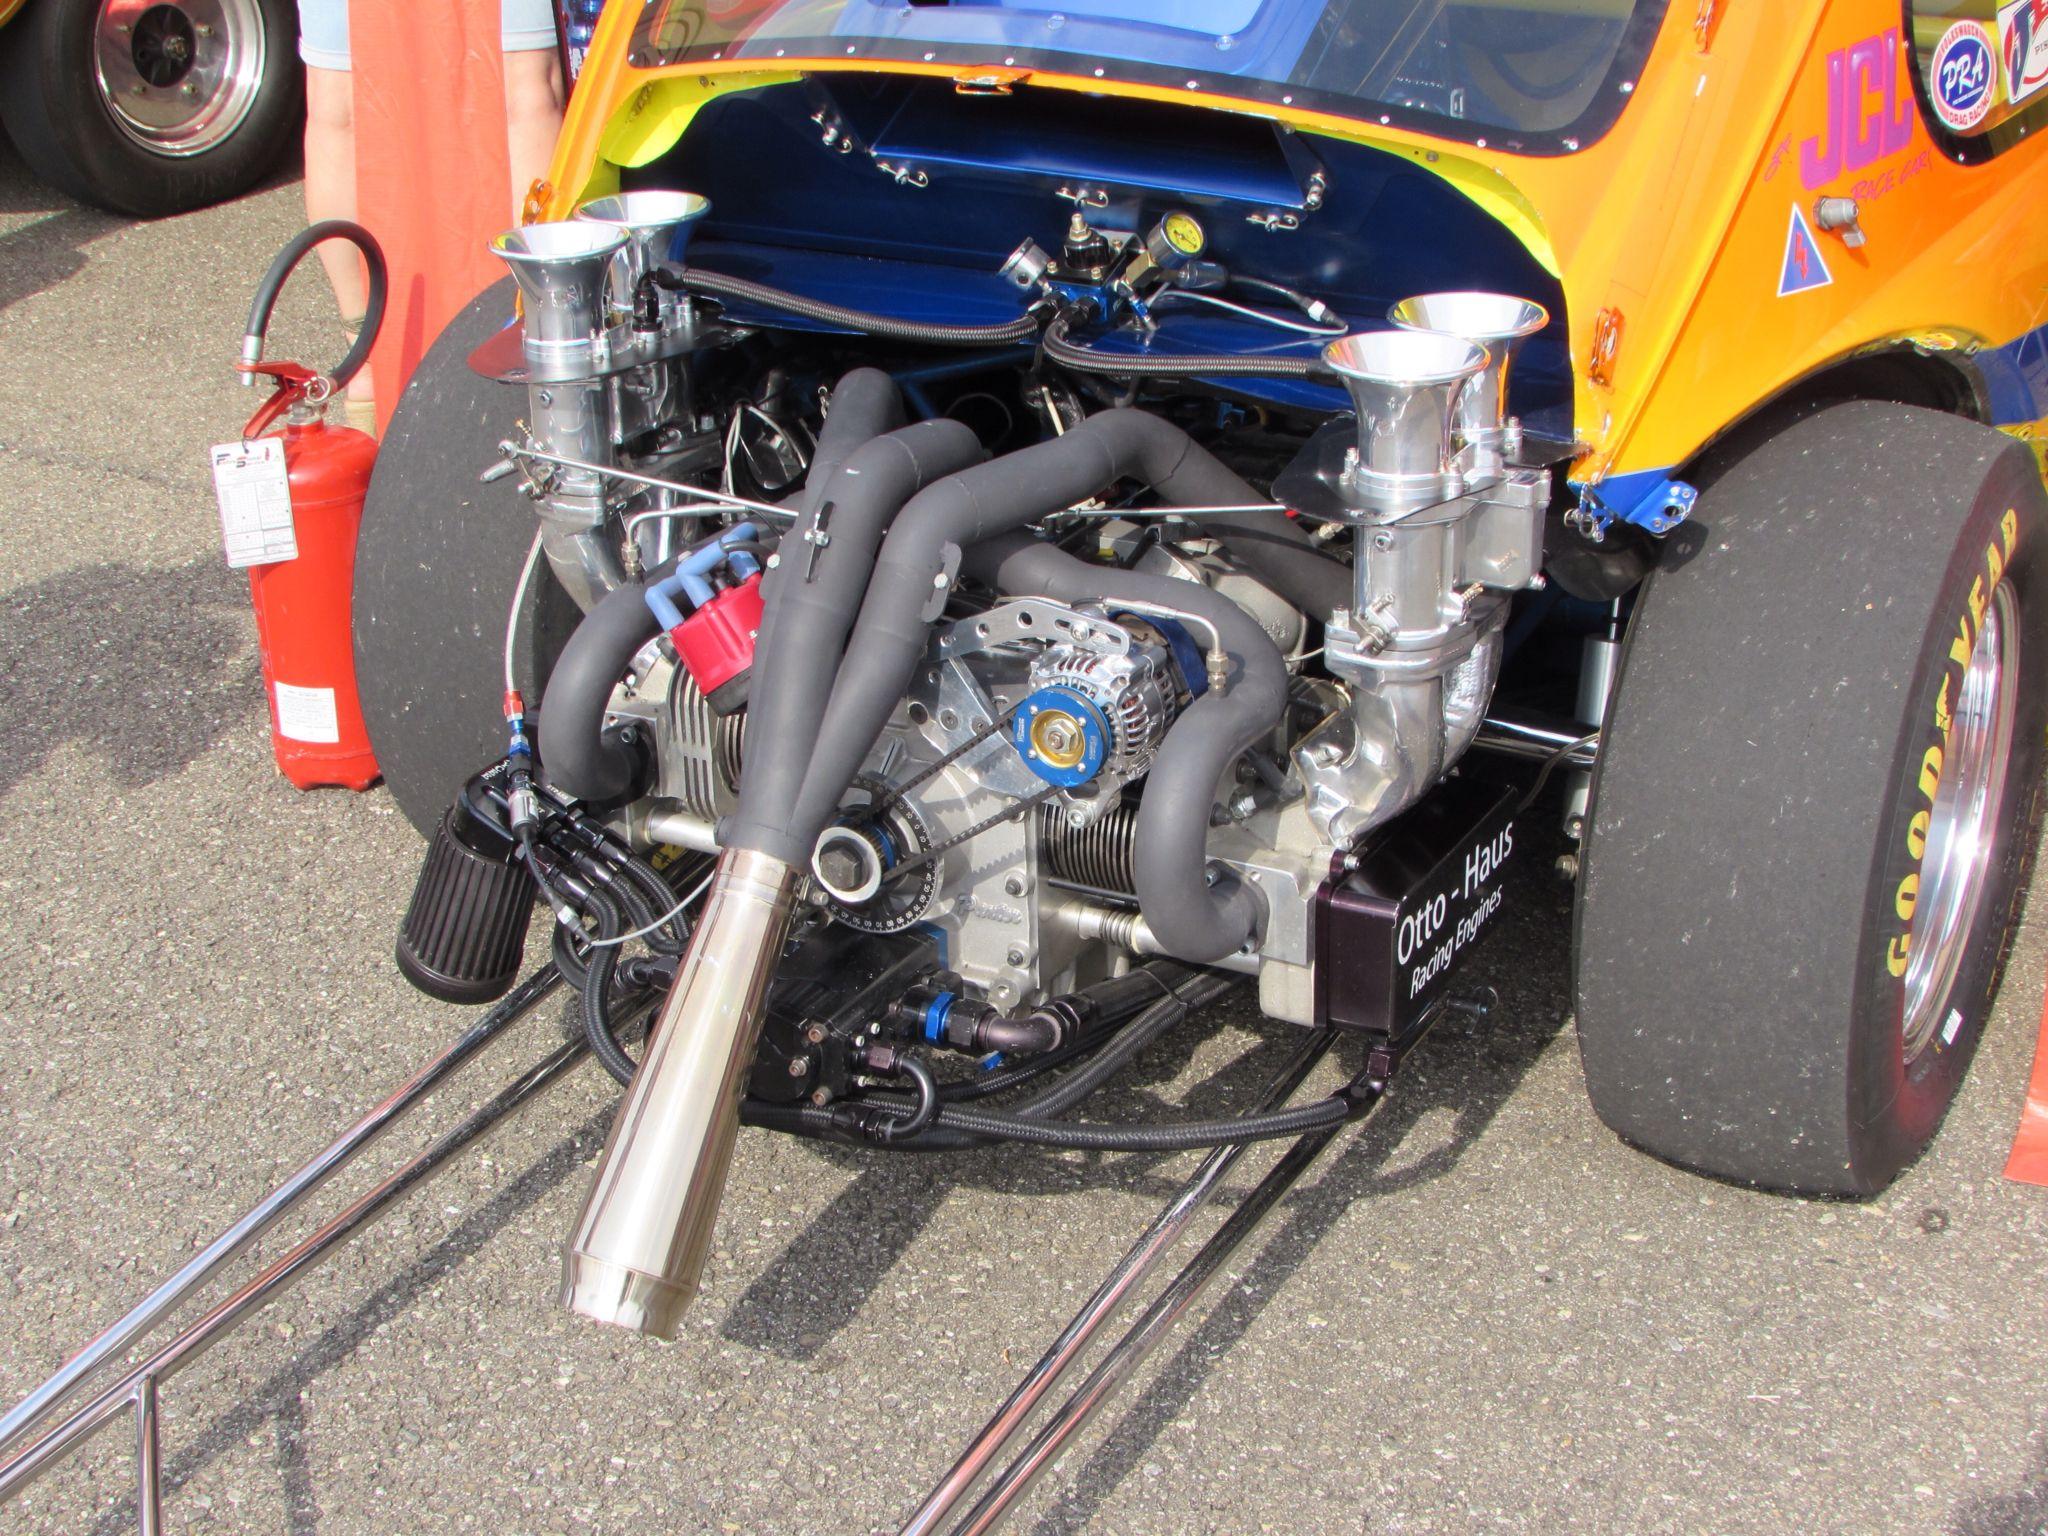 VW dragger @ Hills Race 12 ( Maggiolino )